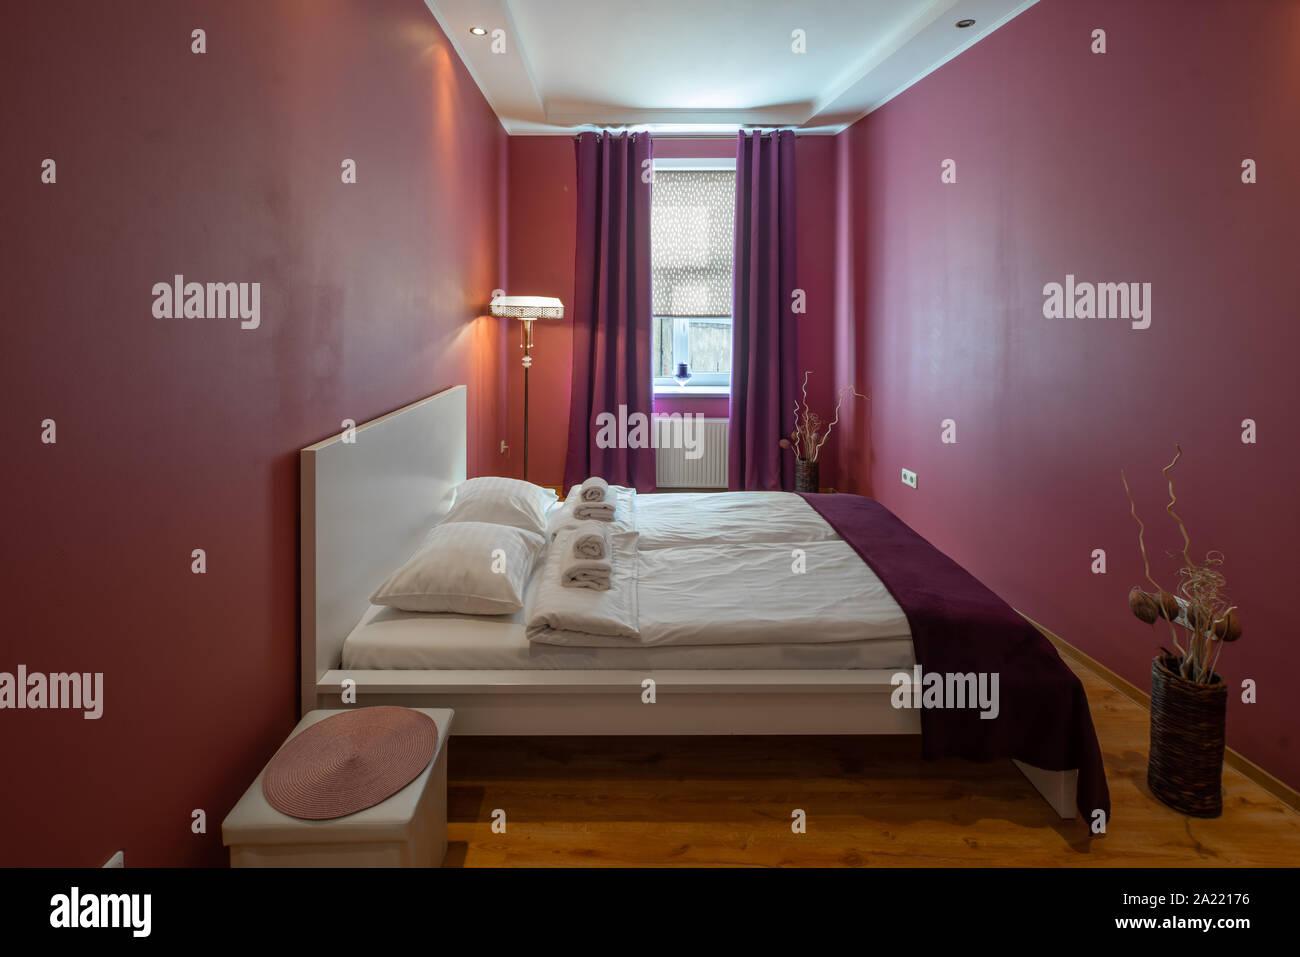 Modern bedroom in scarlet tones. Window with curtains. Floor lamp. Stock Photo